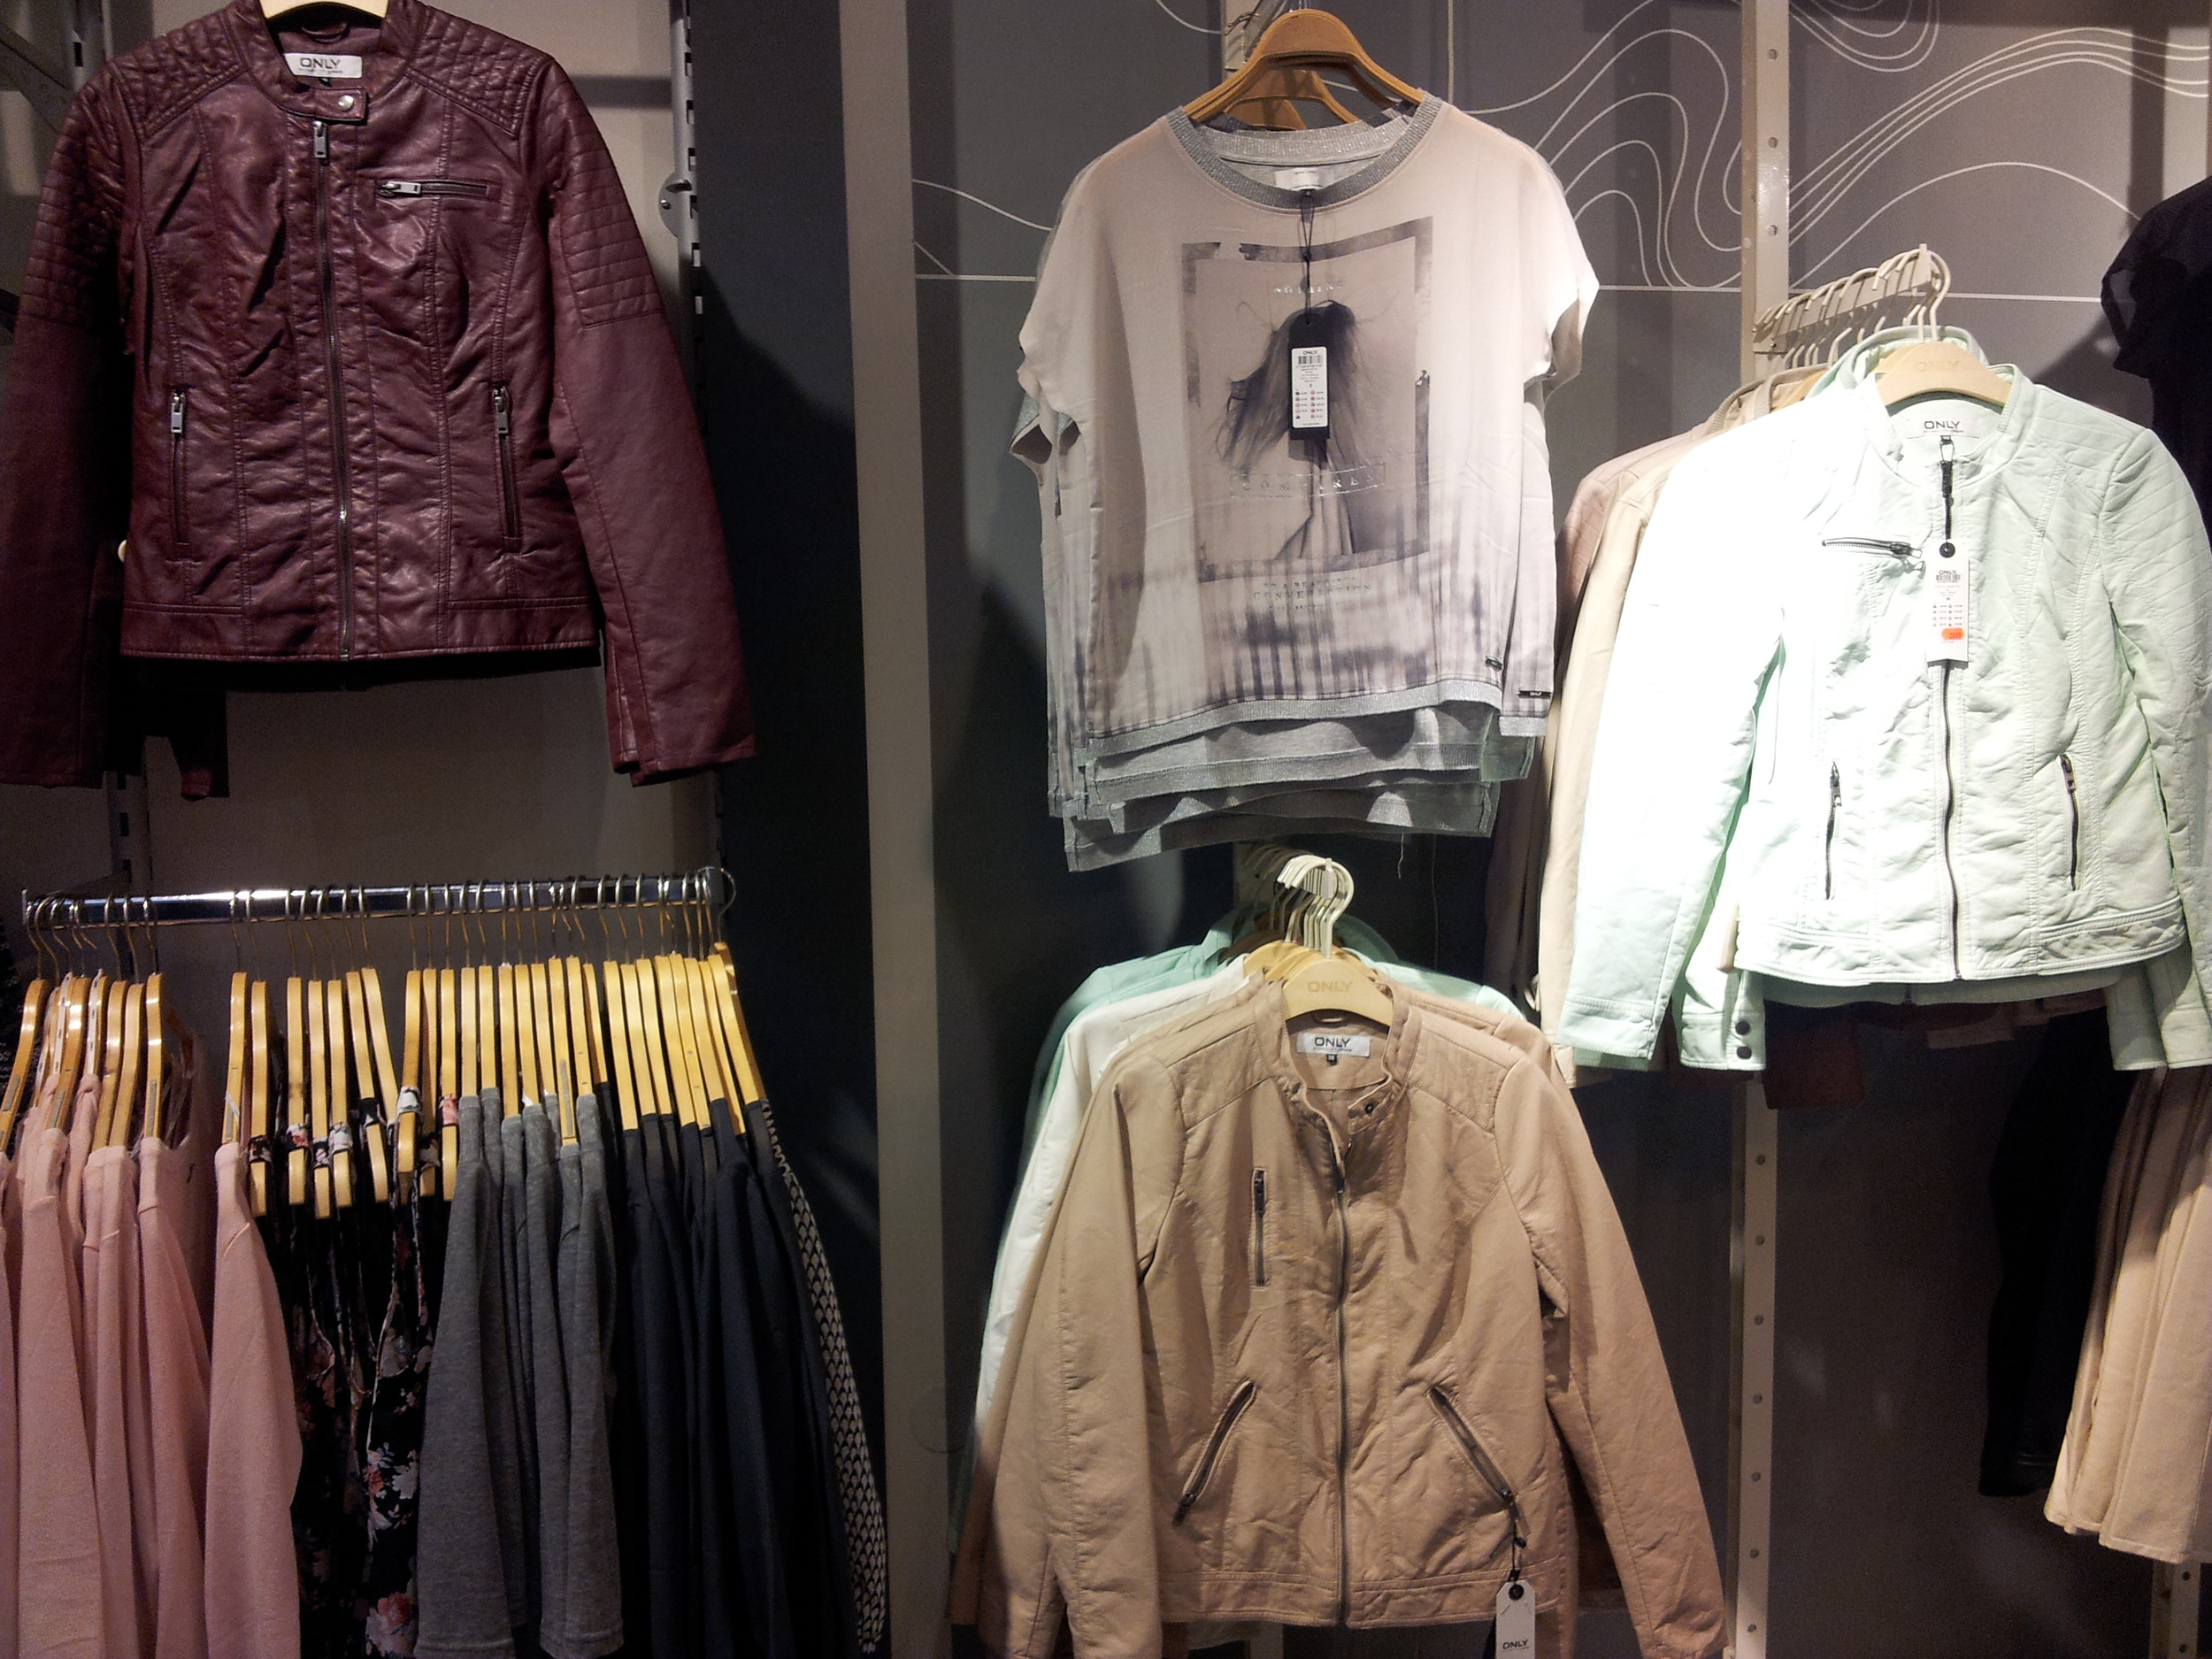 Vegan jackets for 40 euros